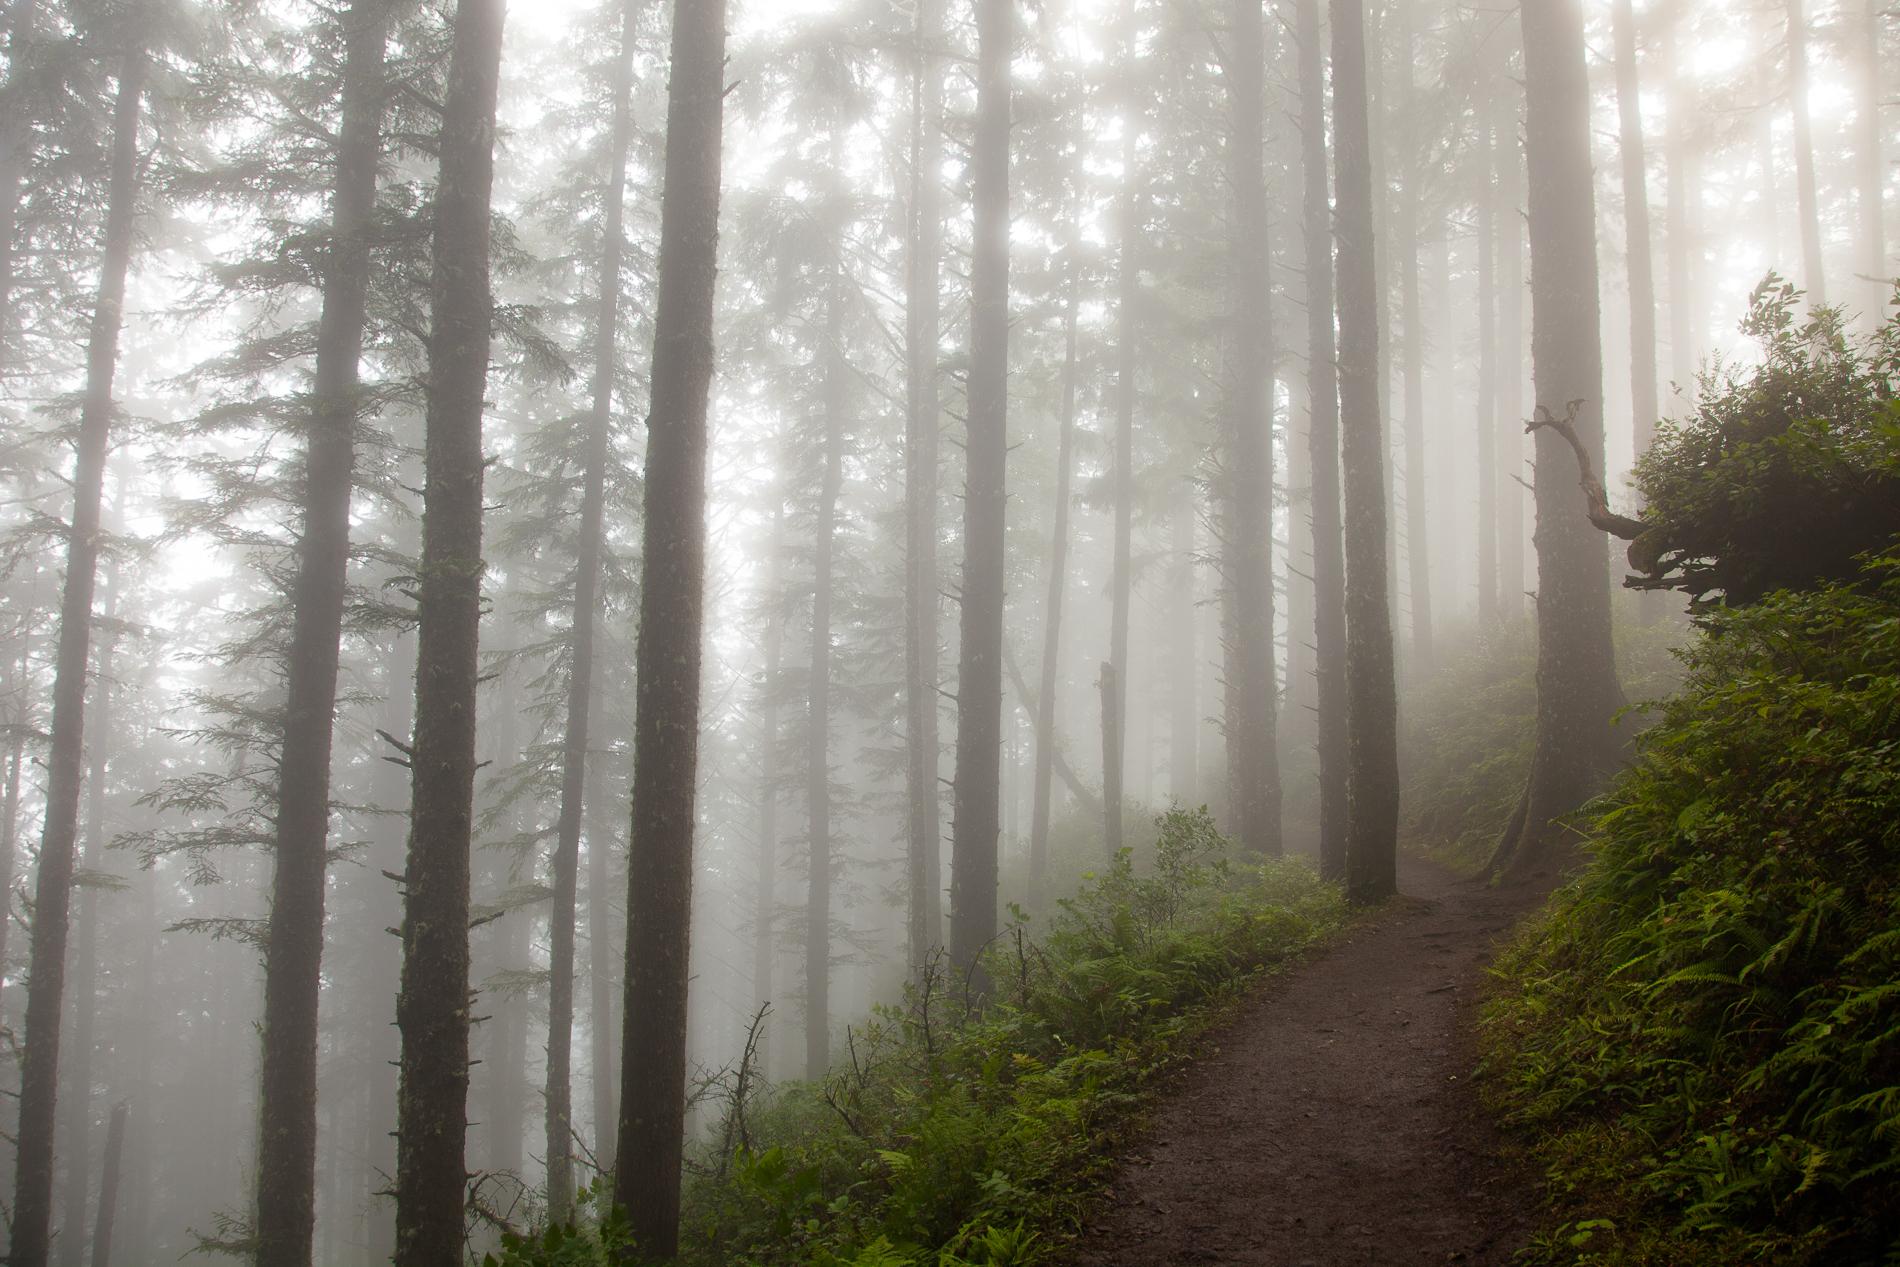 20120805_Oregon_2815.jpg